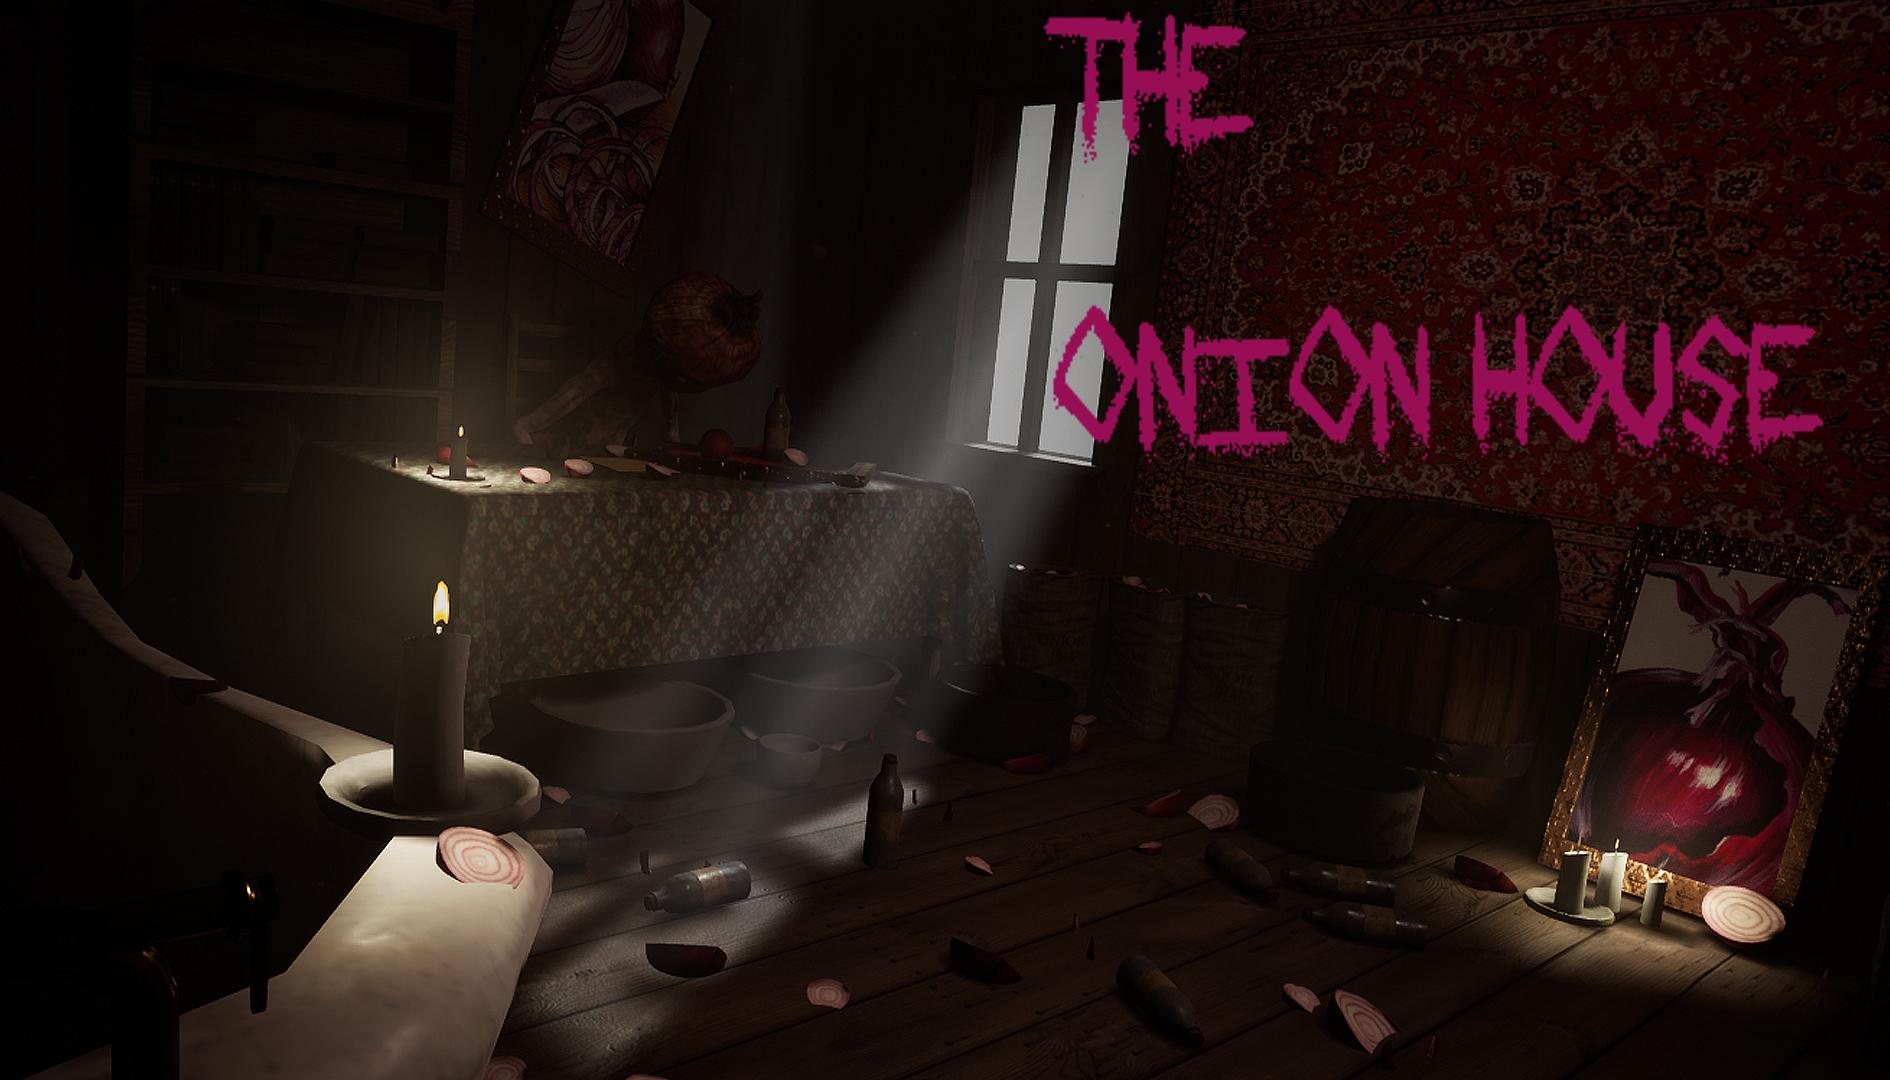 The Onion House